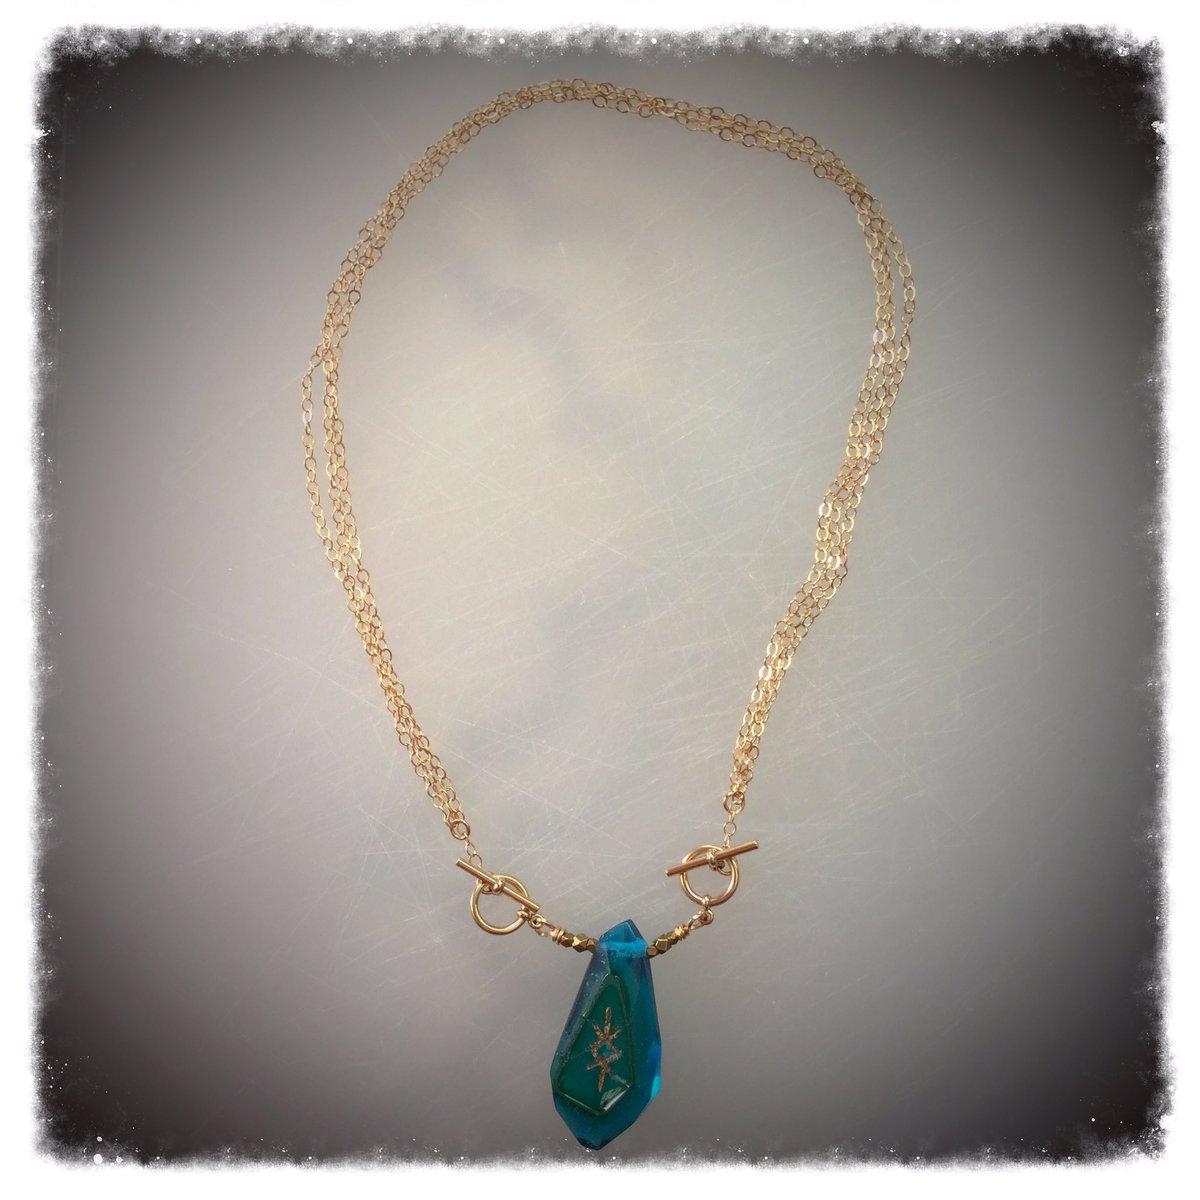 Bind-Runes Necklace #jewelry #JewelryDesigner #jewelrydesign #JewelryLover